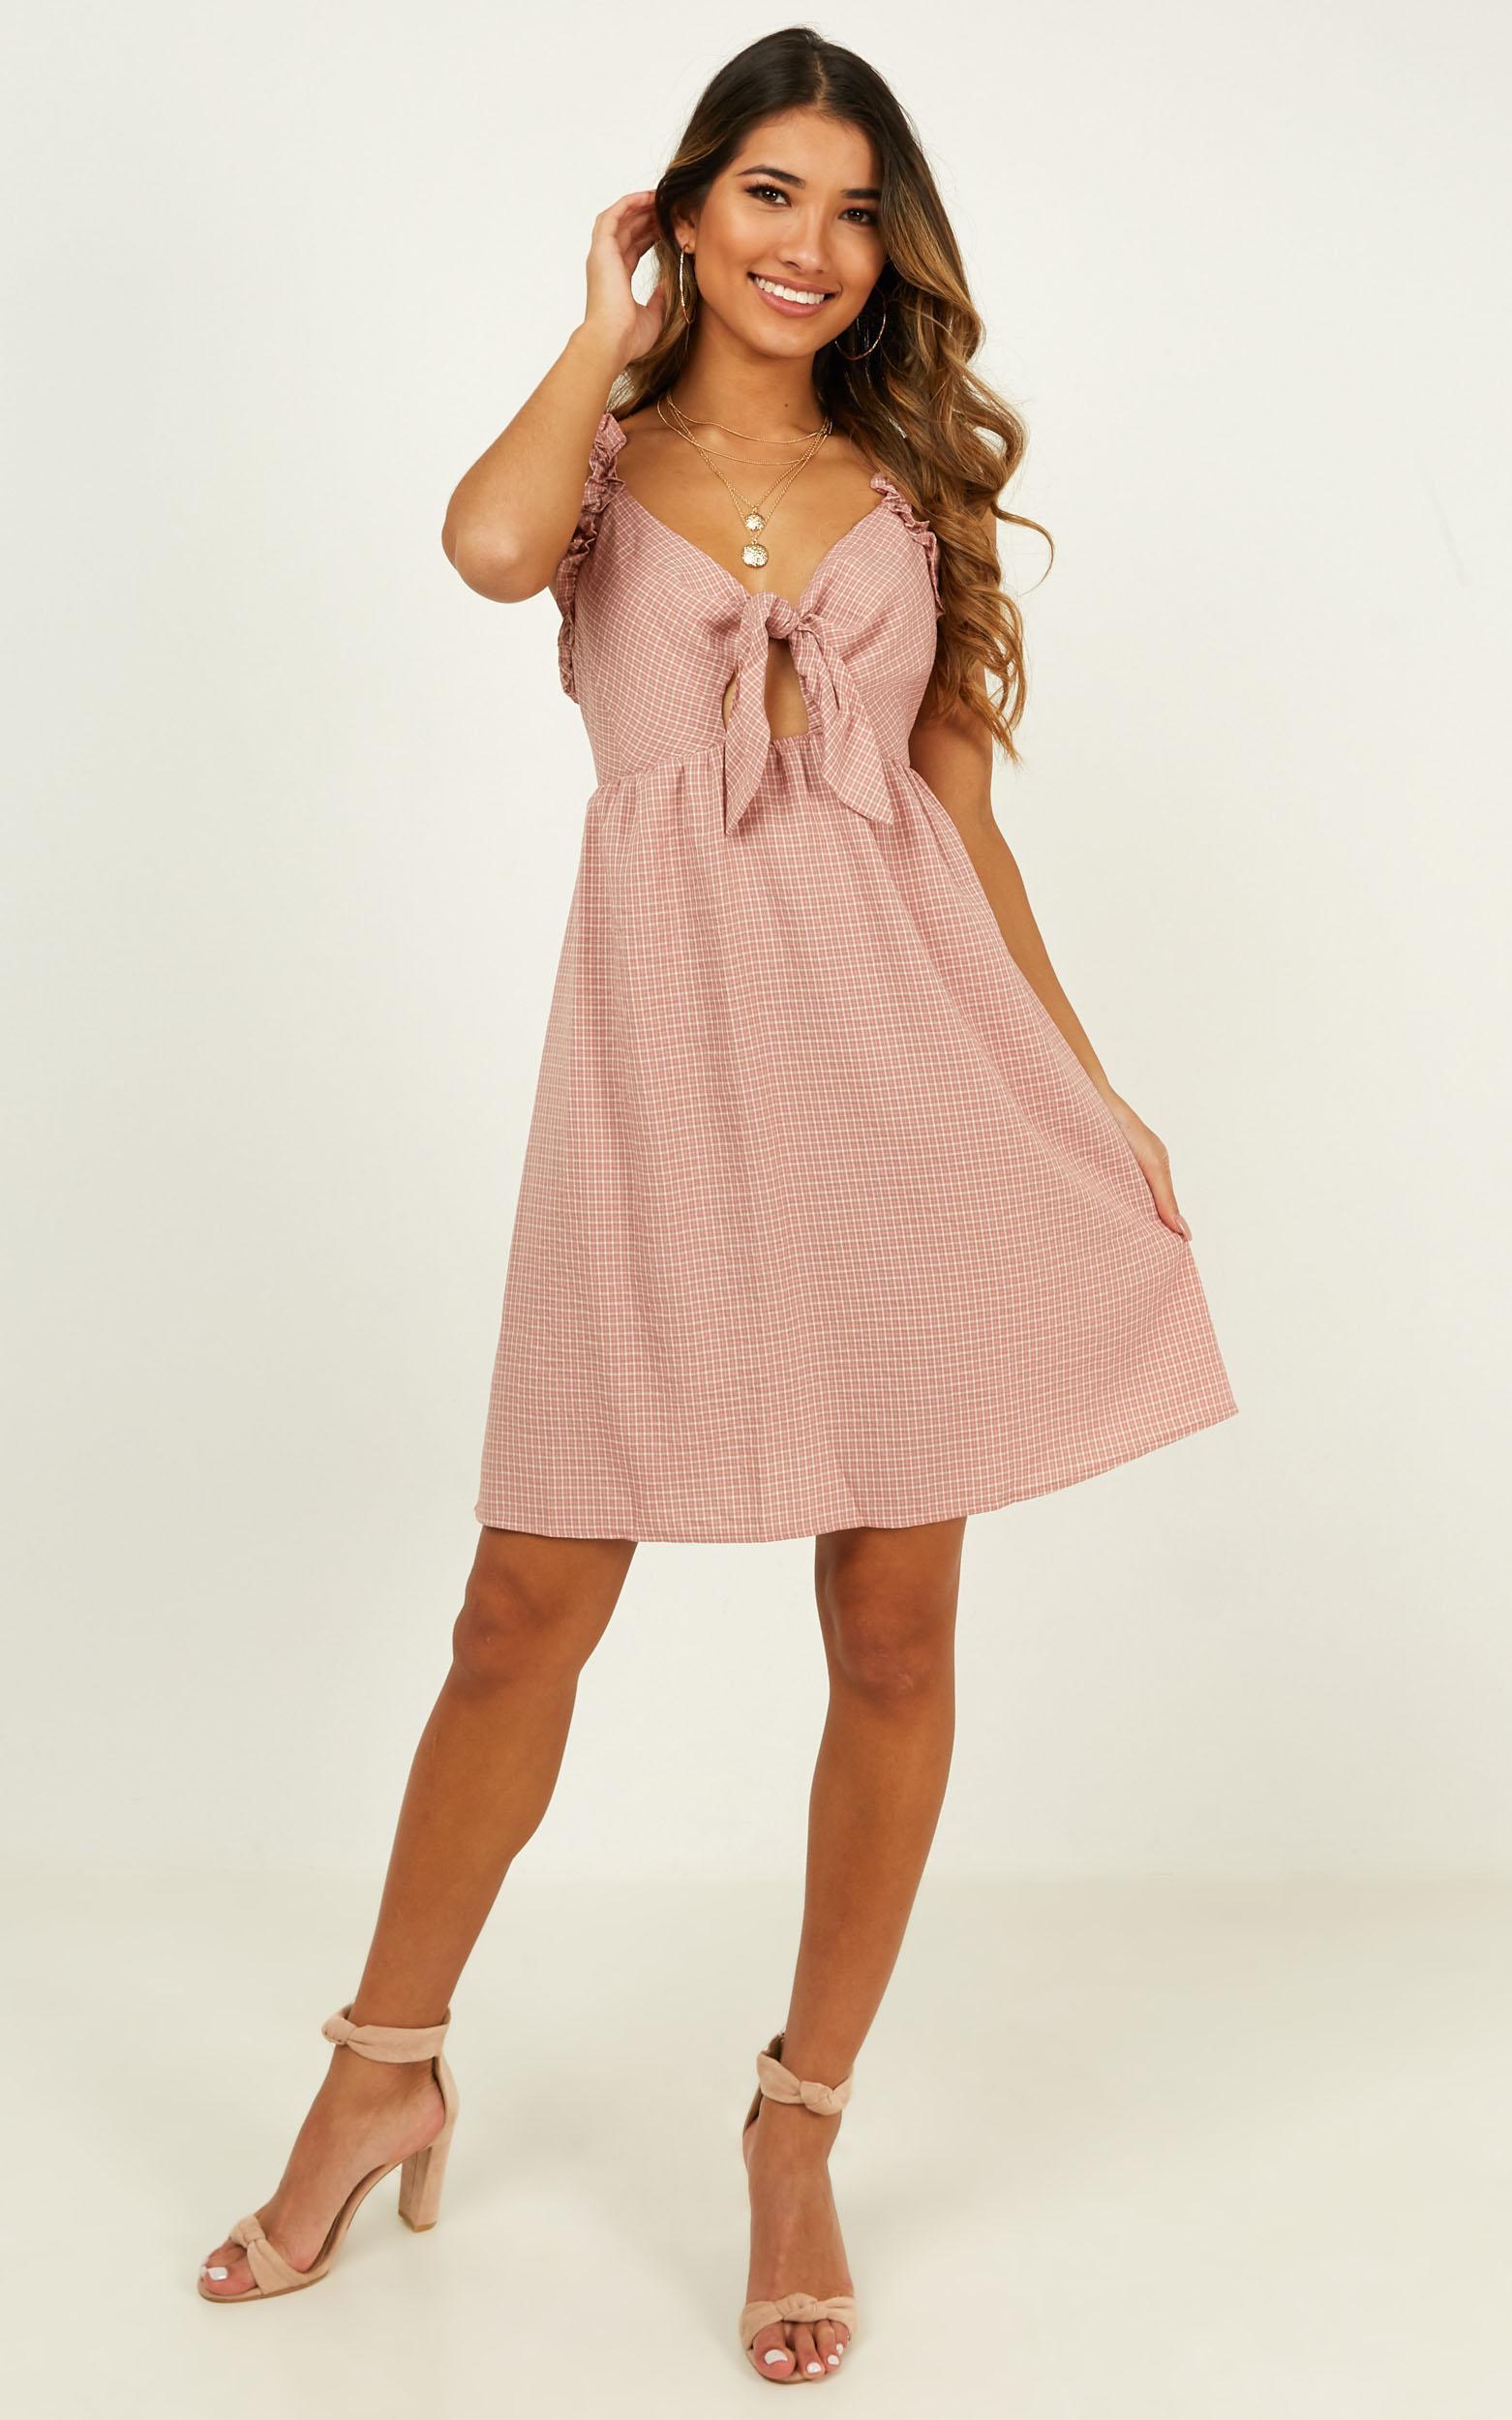 Let Her Go dress in blush check - 12 (L), Blush, hi-res image number null